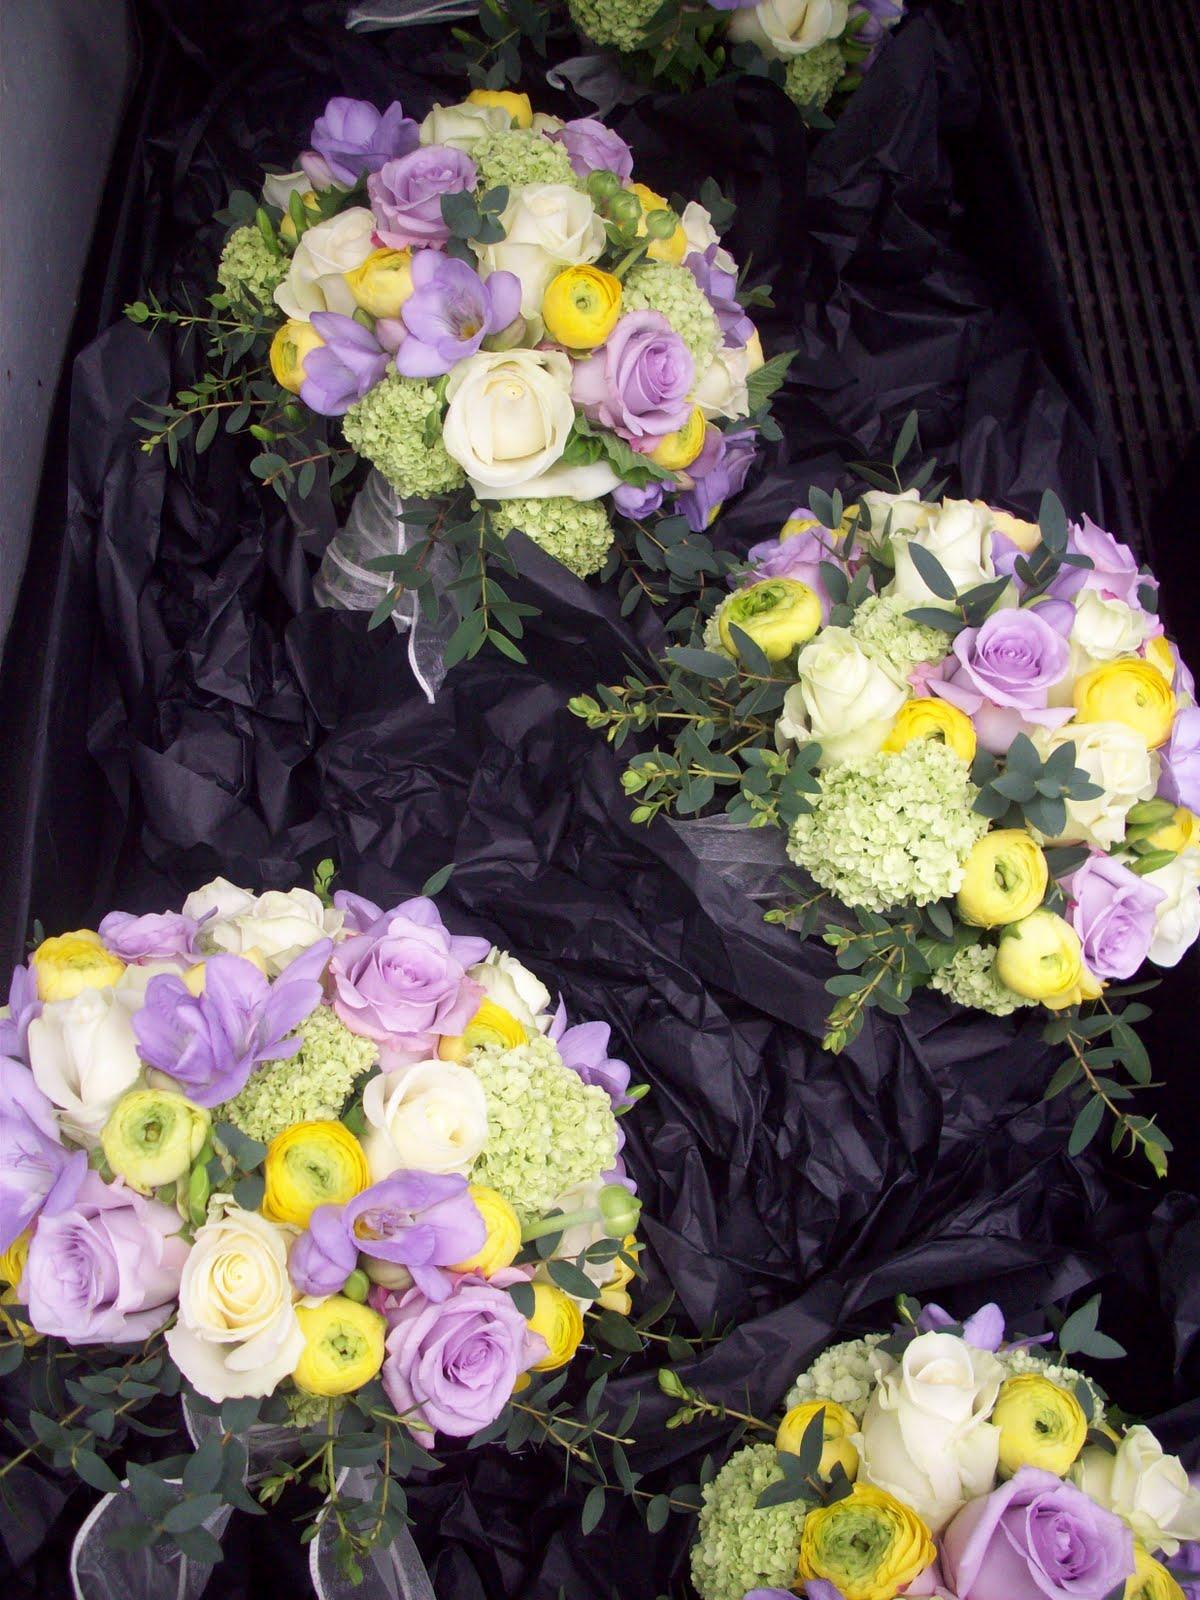 FLORIAN Designer Florist Amp Wedding Flower Specialist May 2010